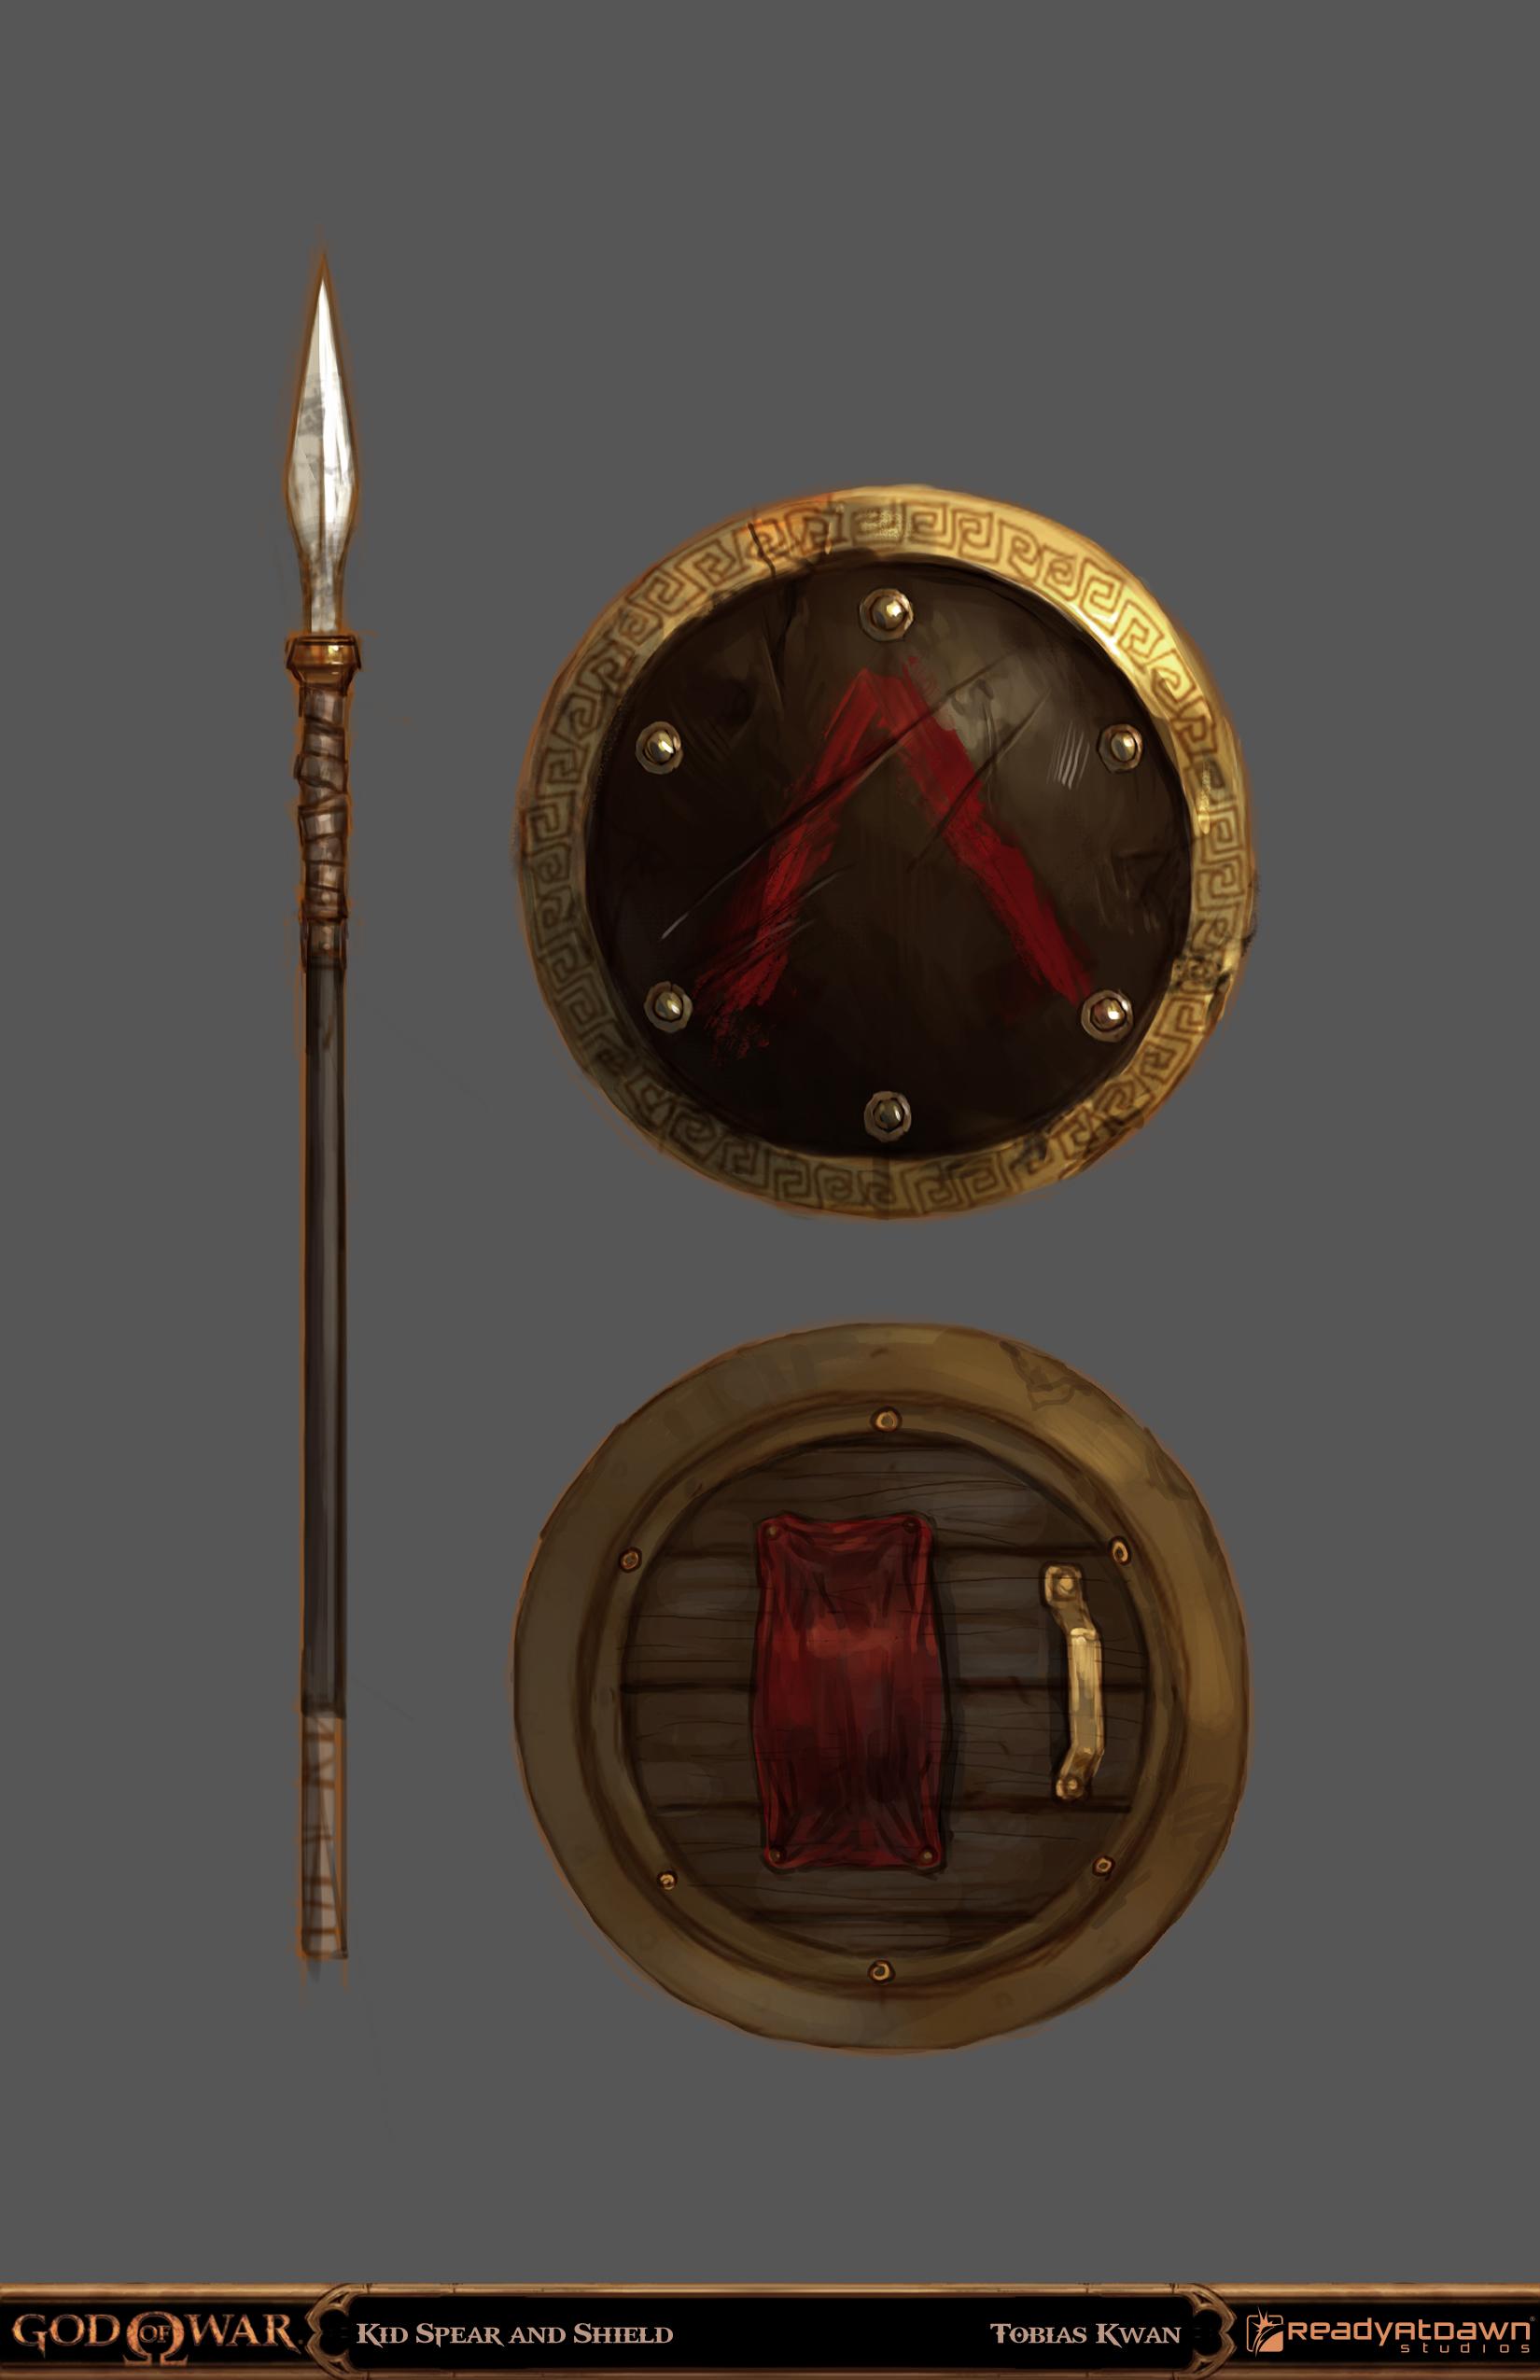 kid spear and shield#1.jpg